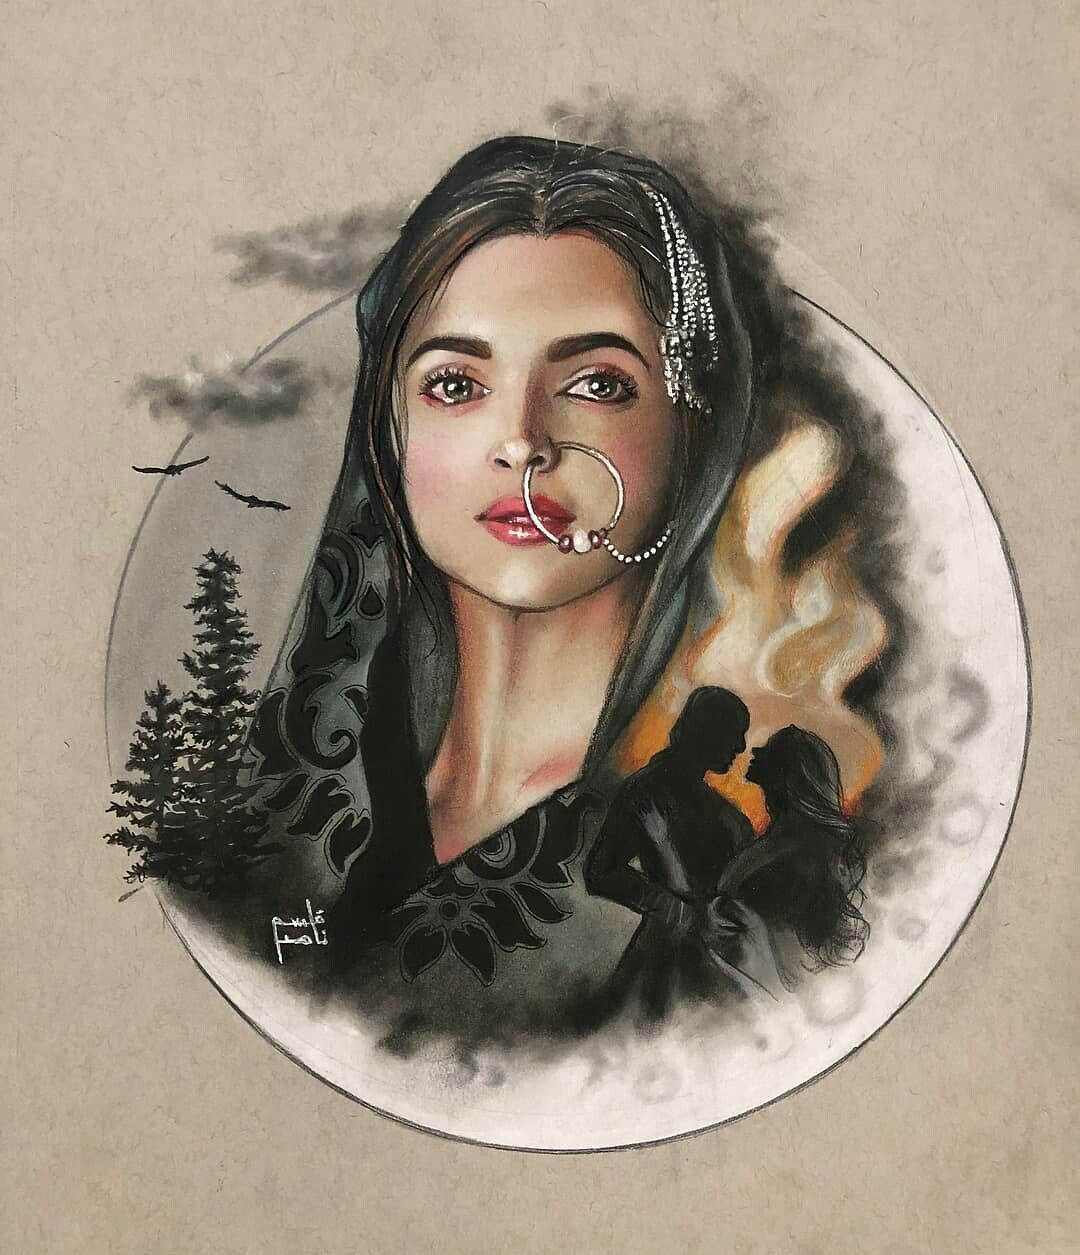 Pin by Bunny on Deepika Padukone | Indian paintings, Sarra ...